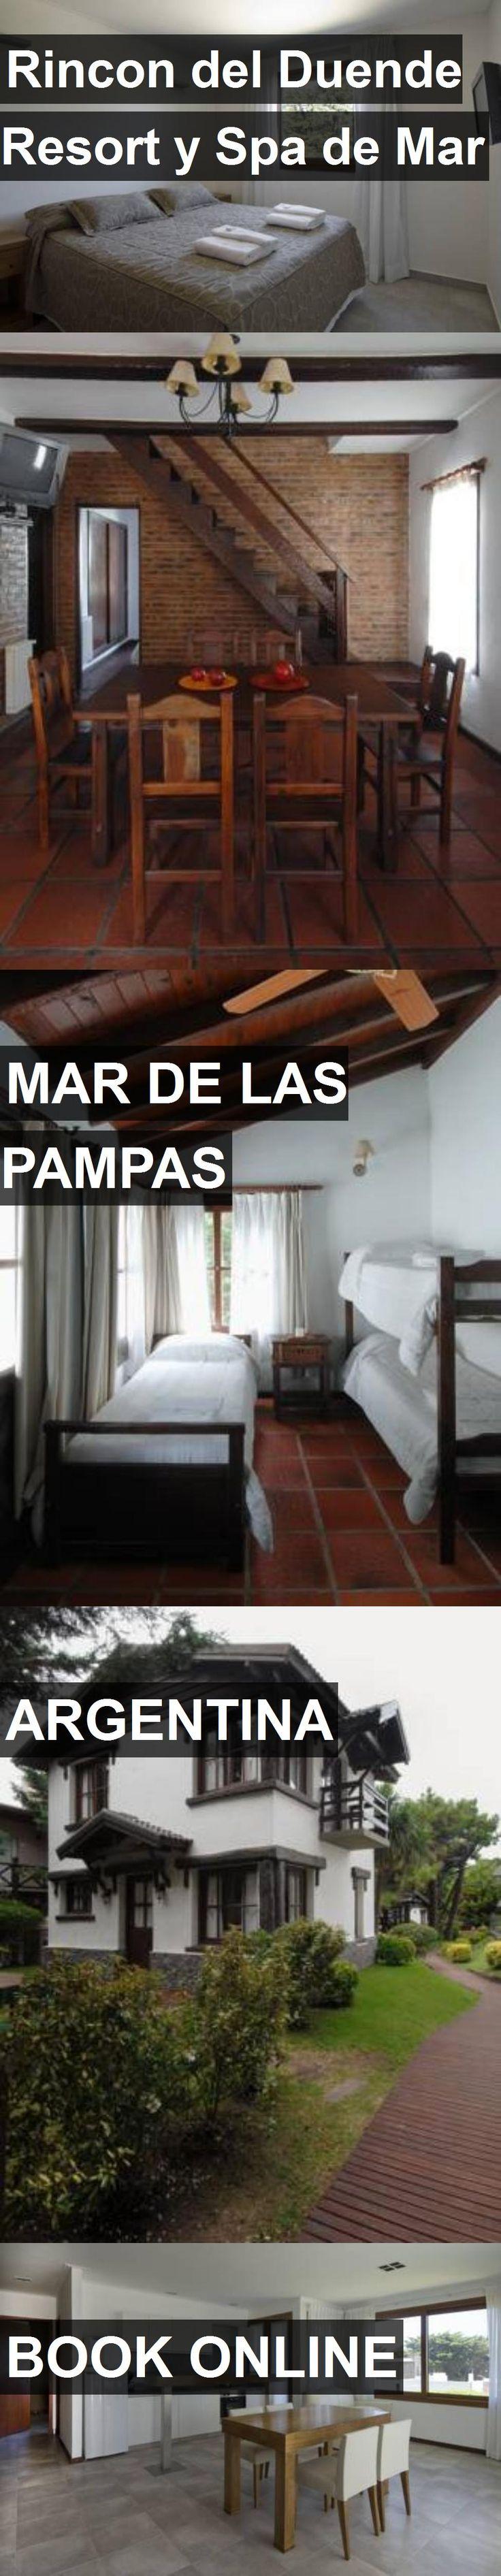 Hotel Rincon del Duende Resort y Spa de Mar in Mar de las Pampas, Argentina. For more information, photos, reviews and best prices please follow the link. #Argentina #MardelasPampas #travel #vacation #hotel